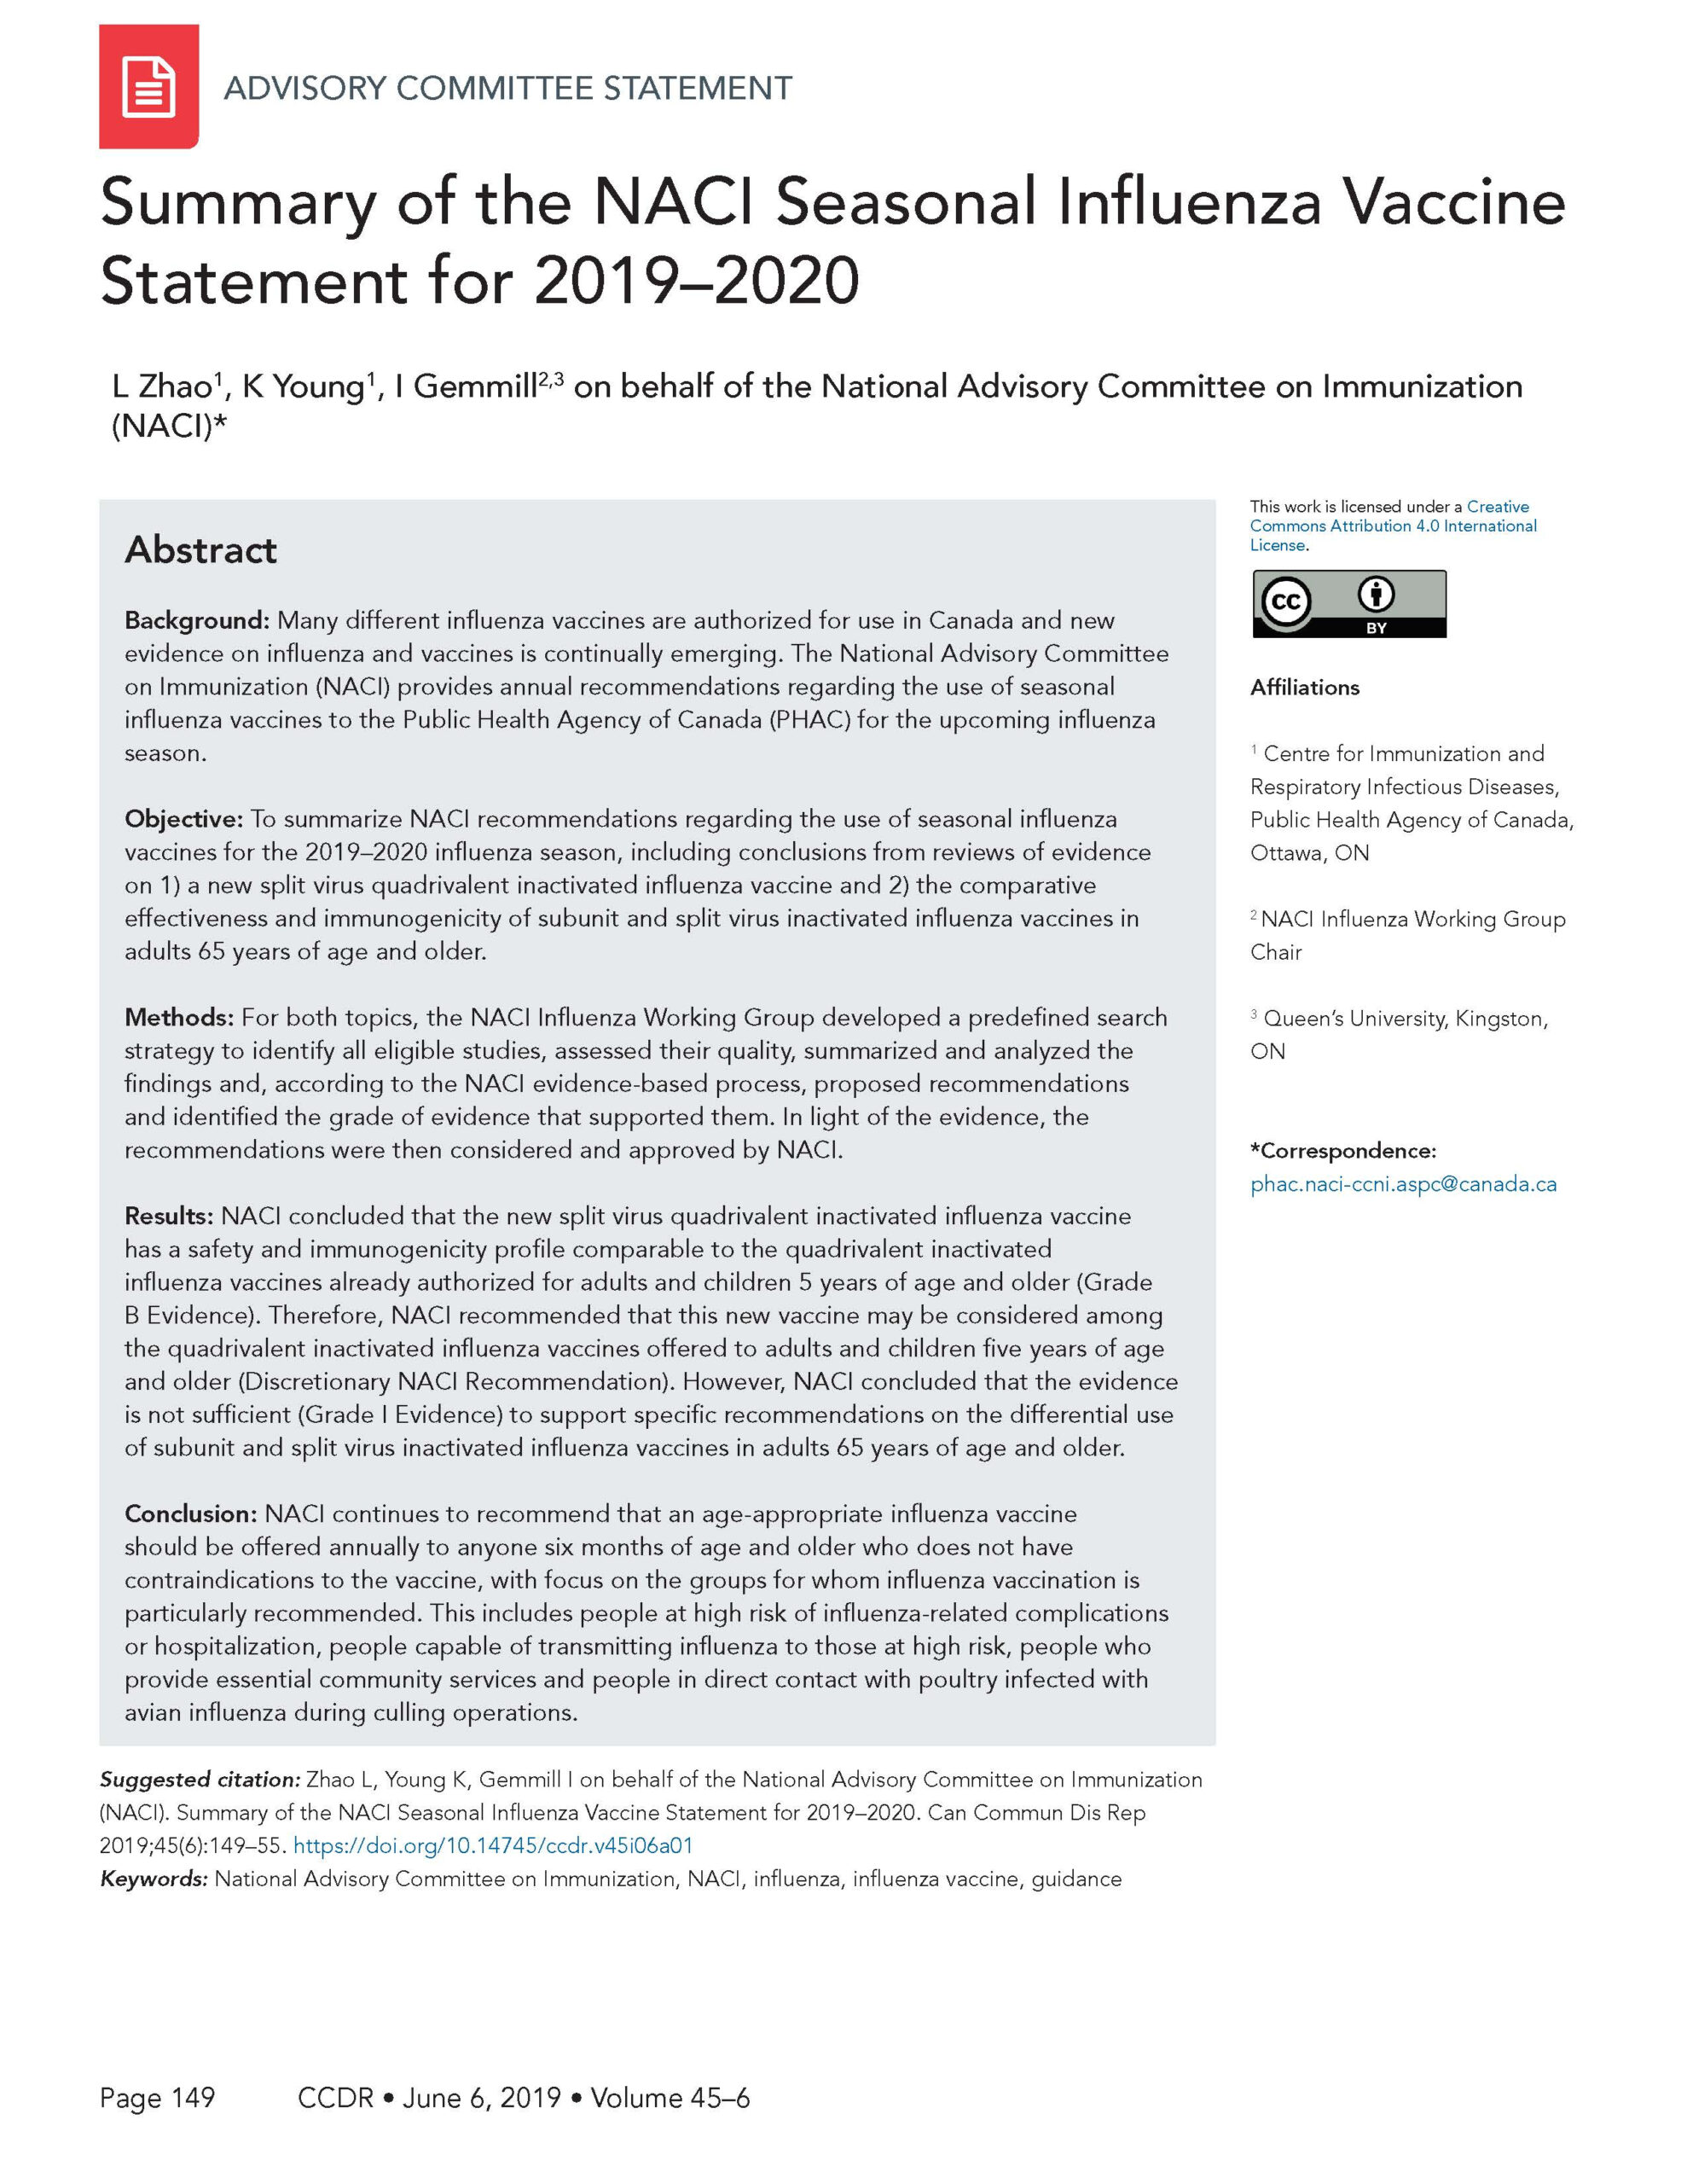 Naci Seasonal Influenza Vaccine Statement For 2019–2020 in Mcgeers Criteria 2021 Checklist